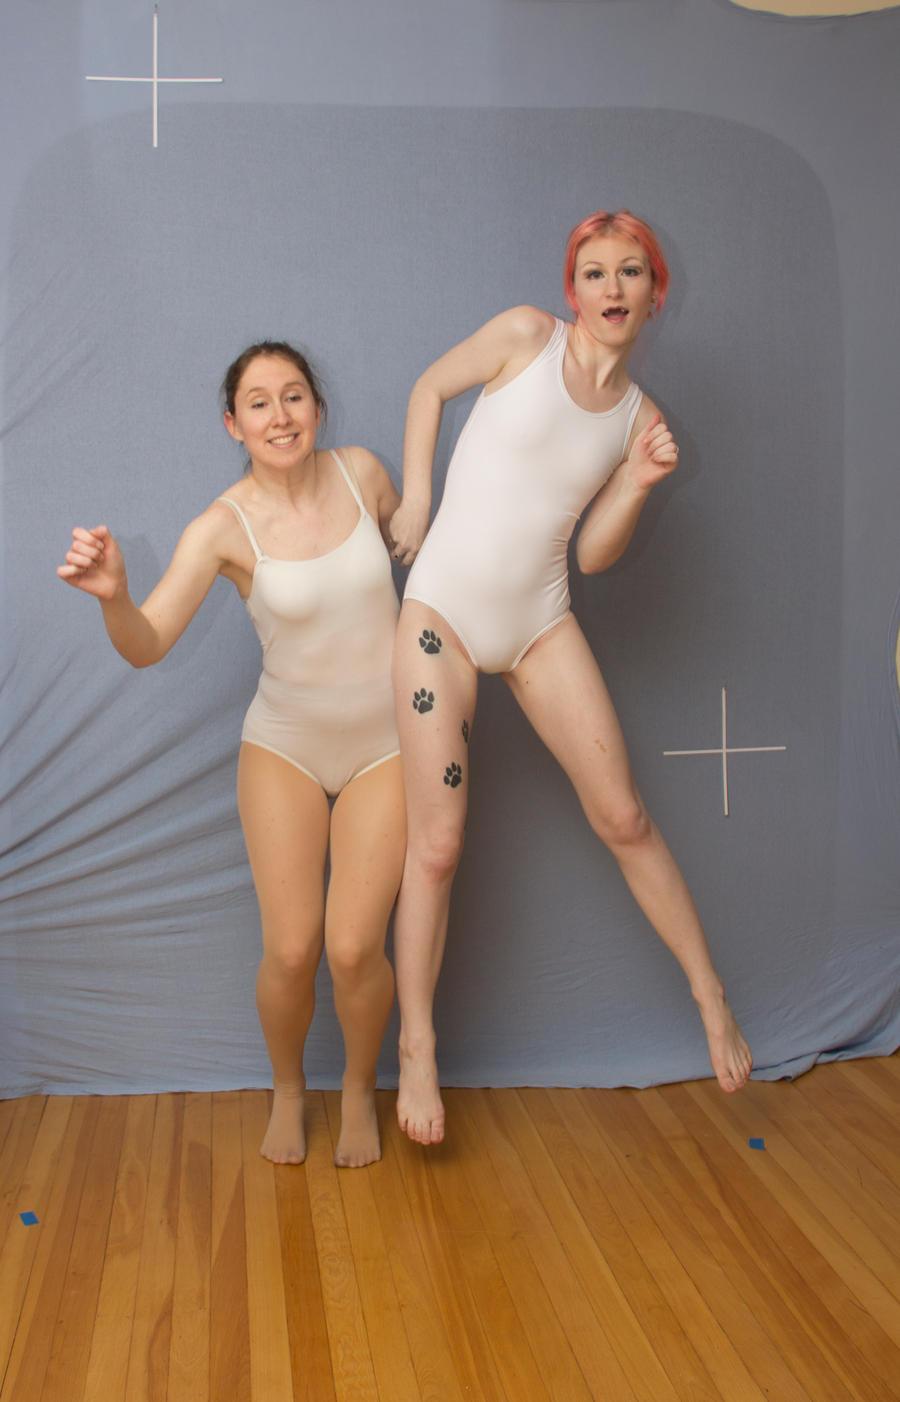 Senshistock collab: hip bump fail by Sinned-angel-stock